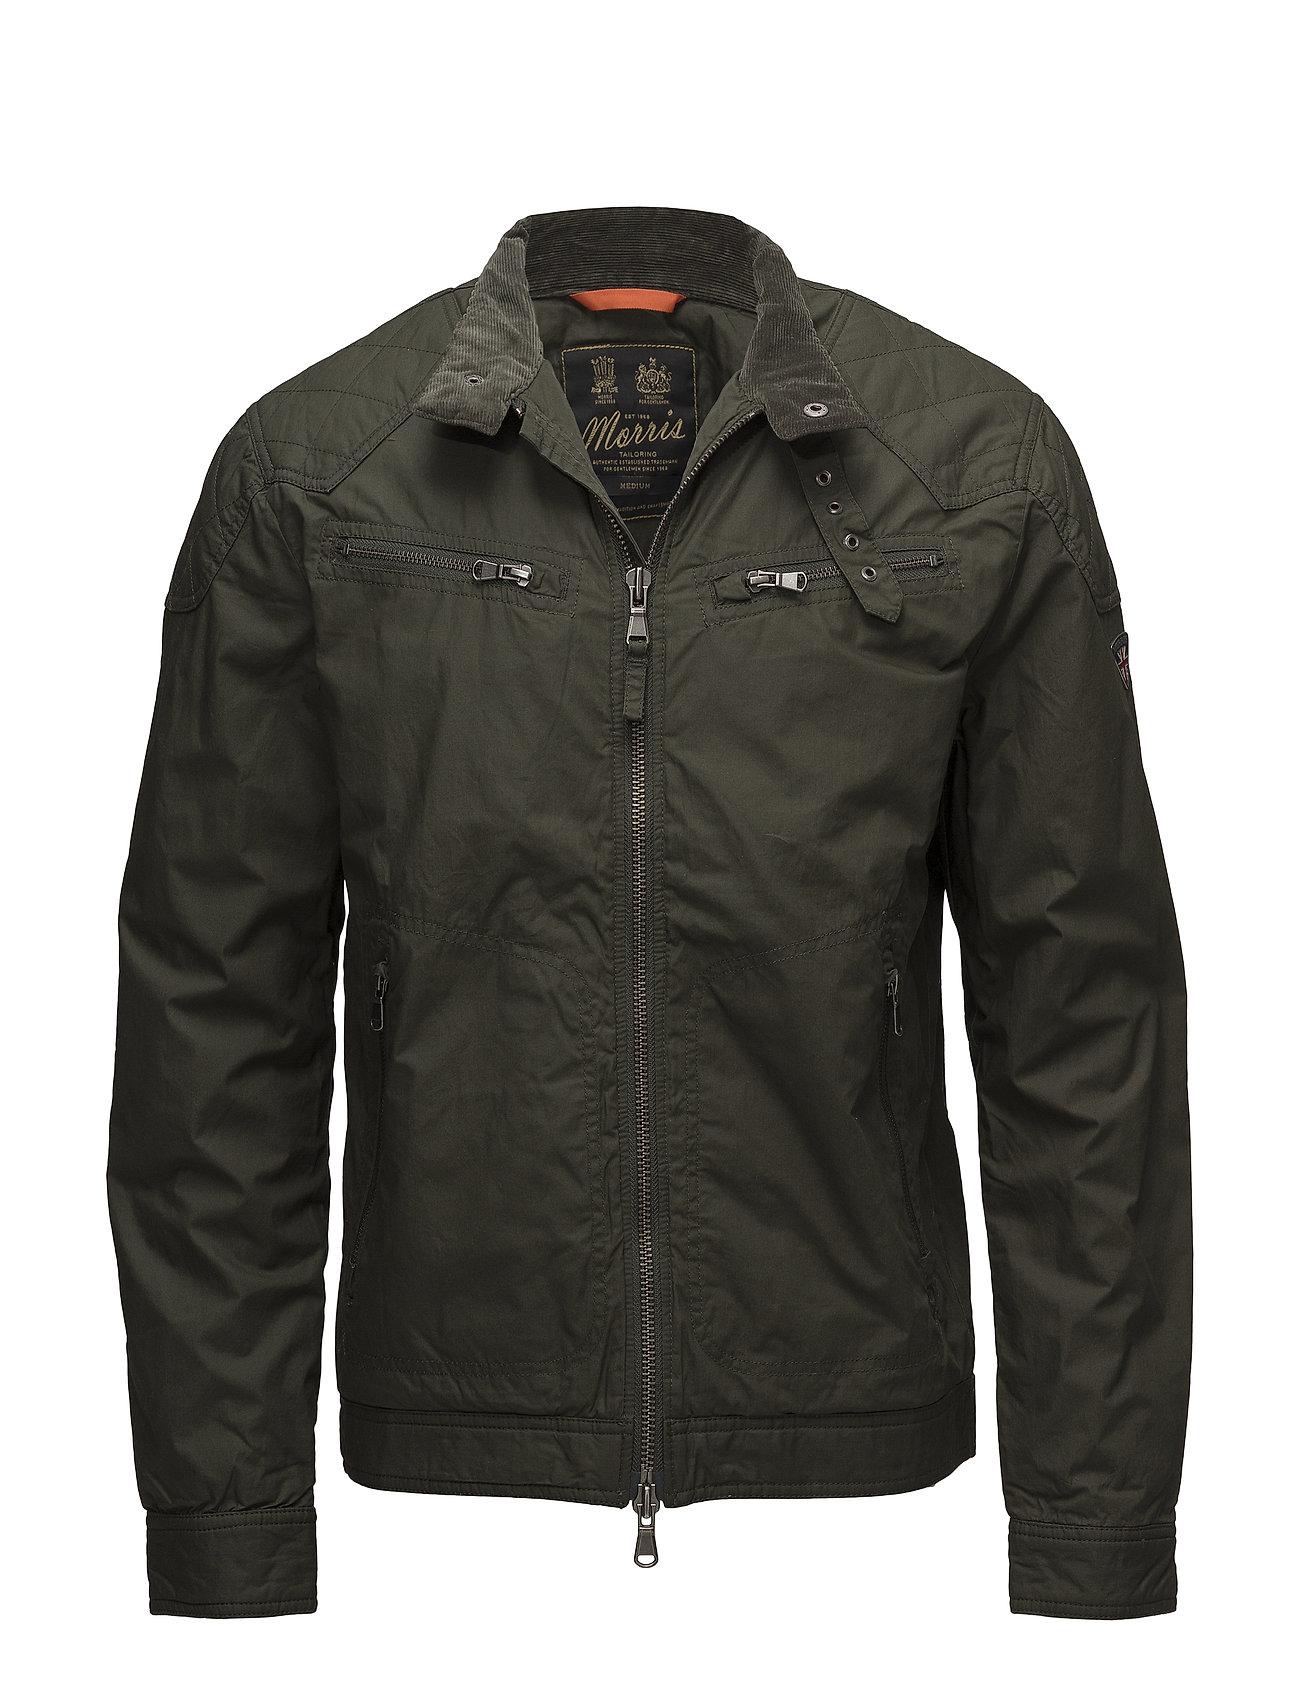 Morris Foxhill Jacket - OLIVE